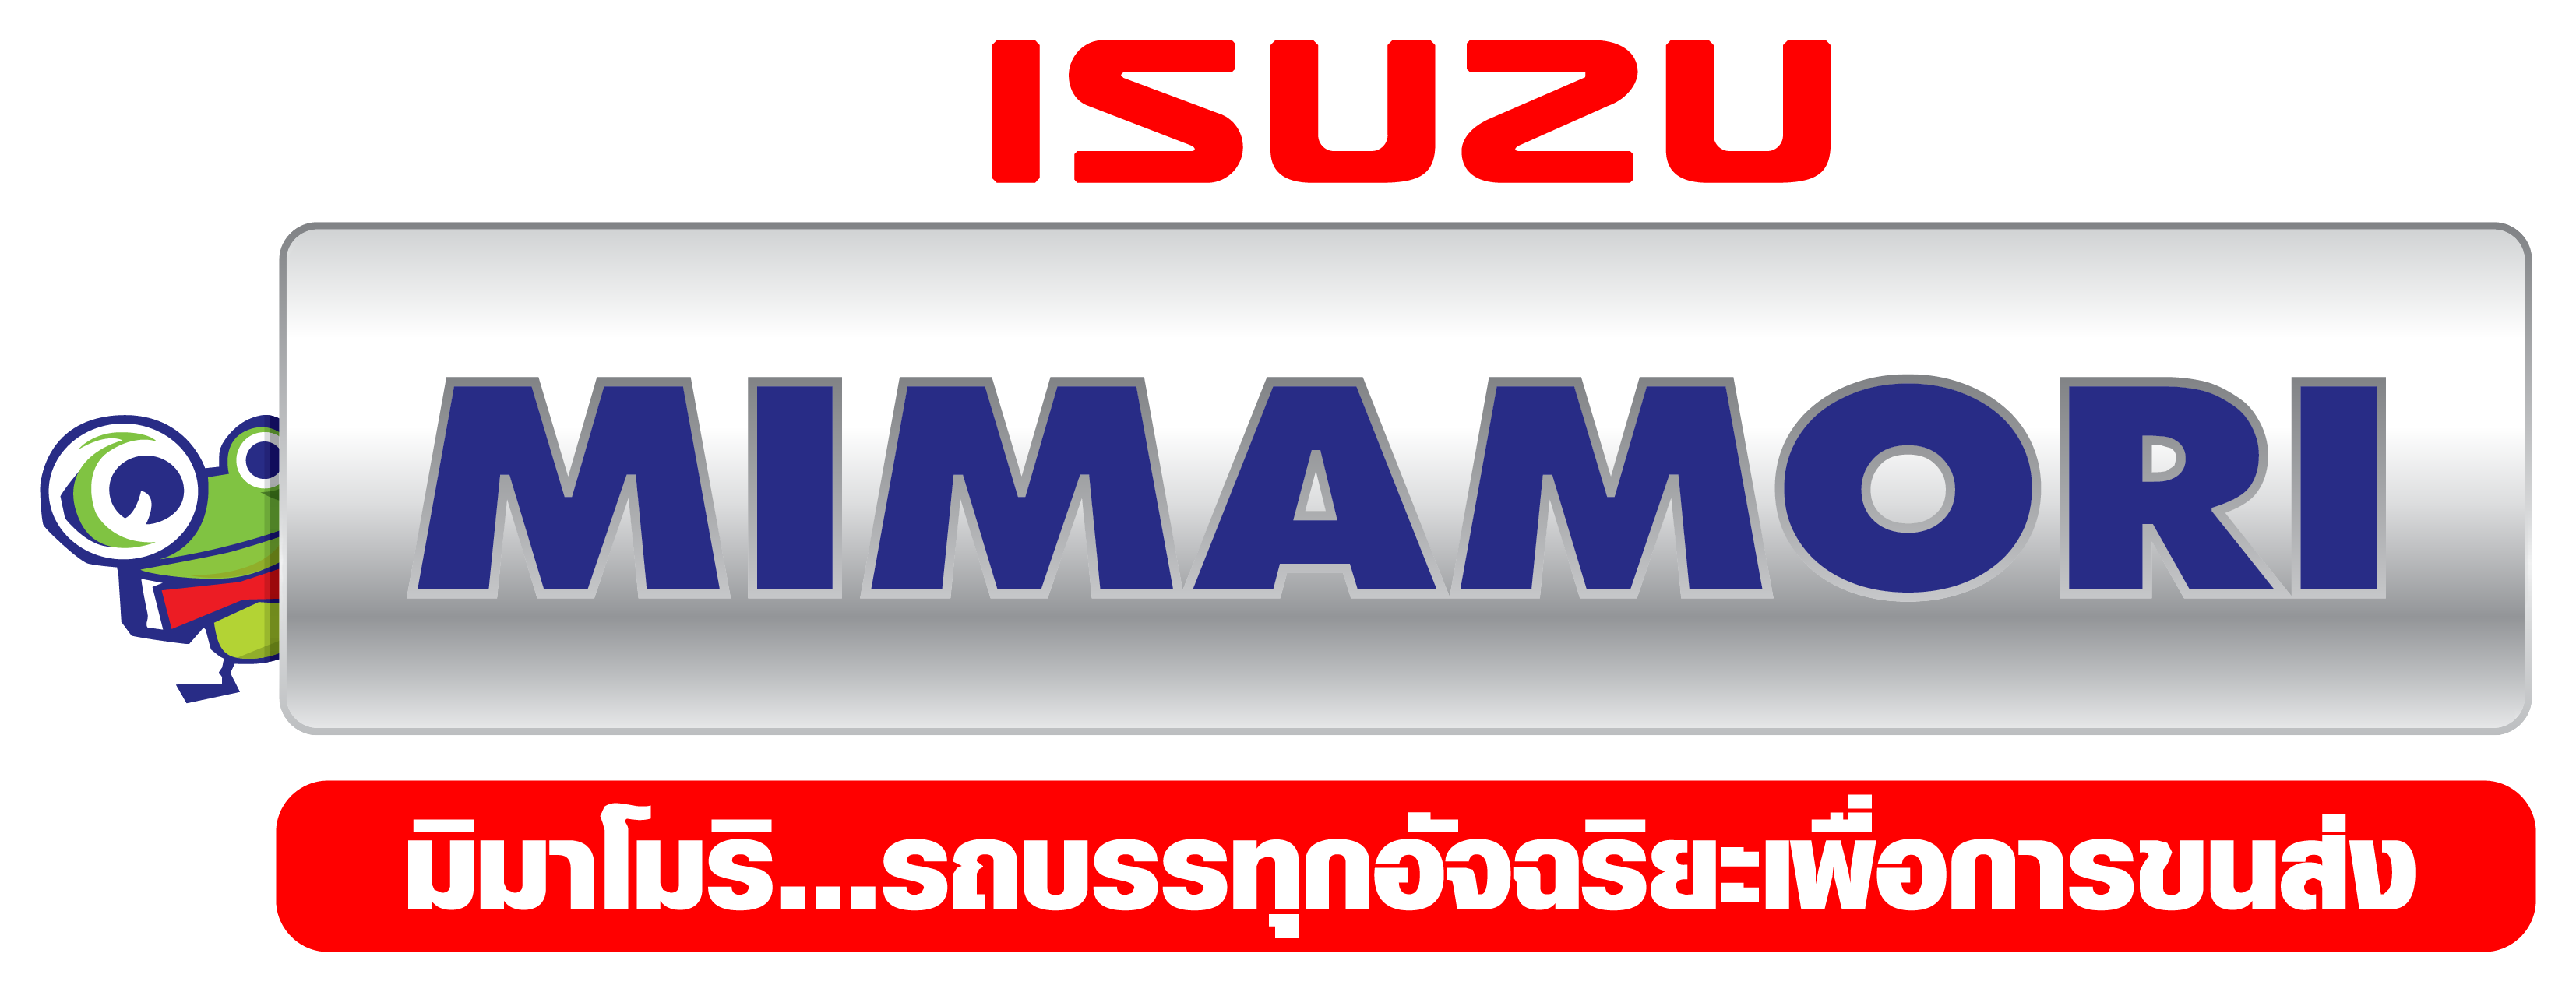 Mimamori